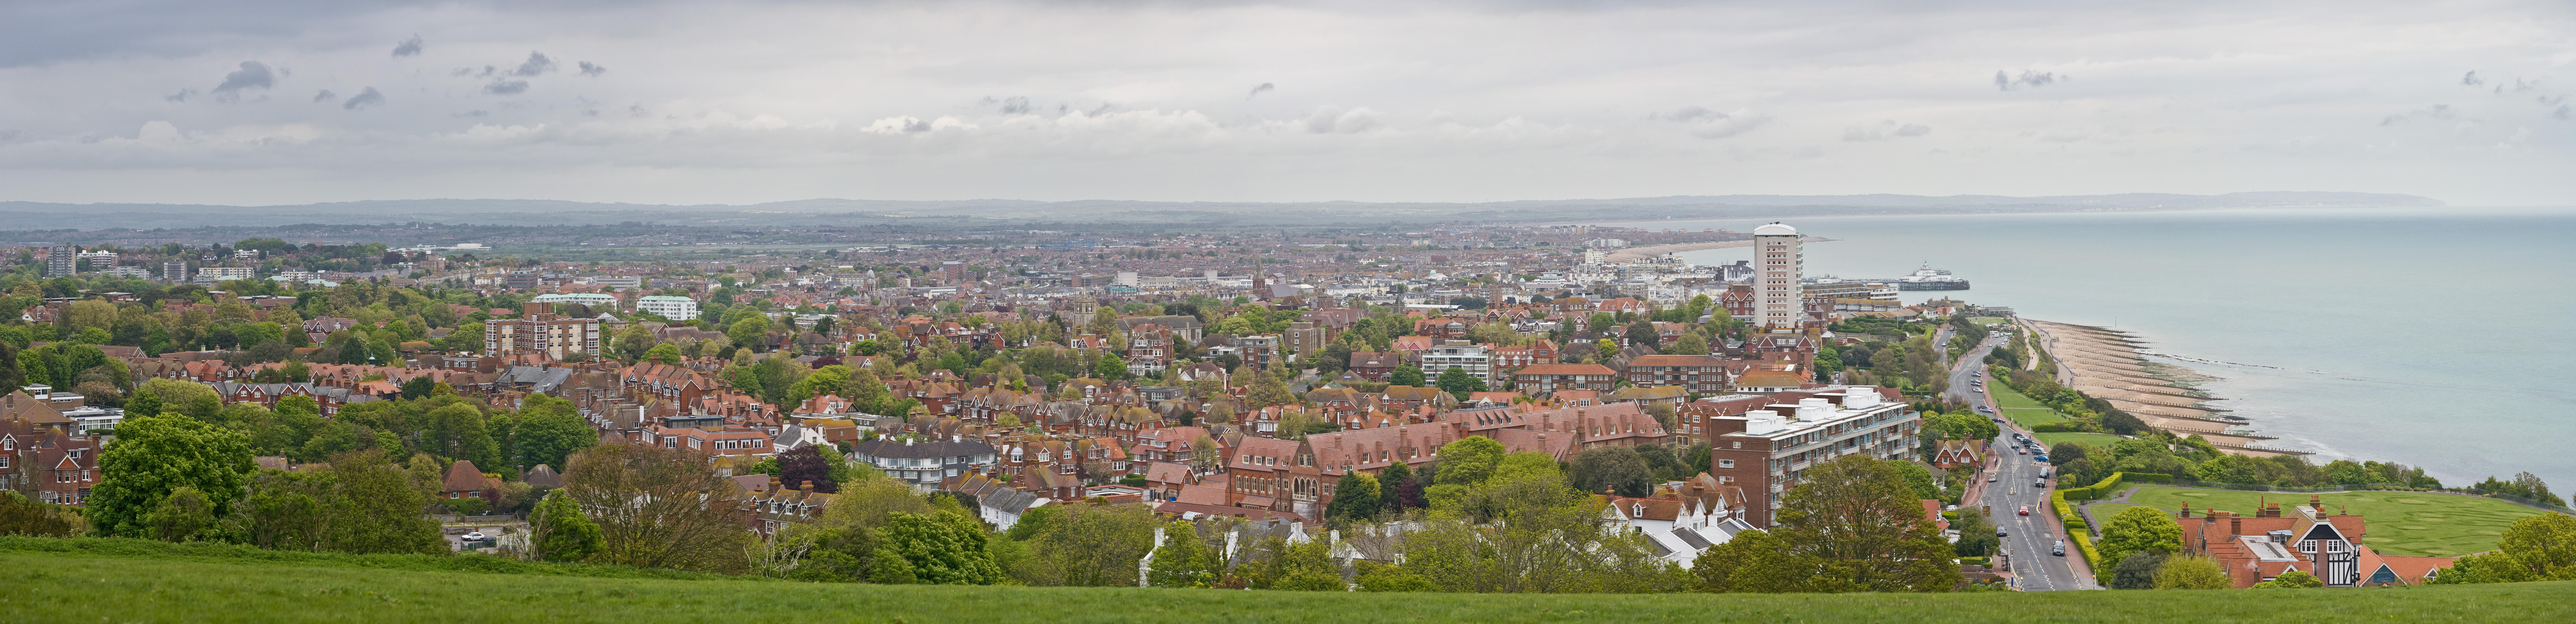 england panorama lake - photo #31